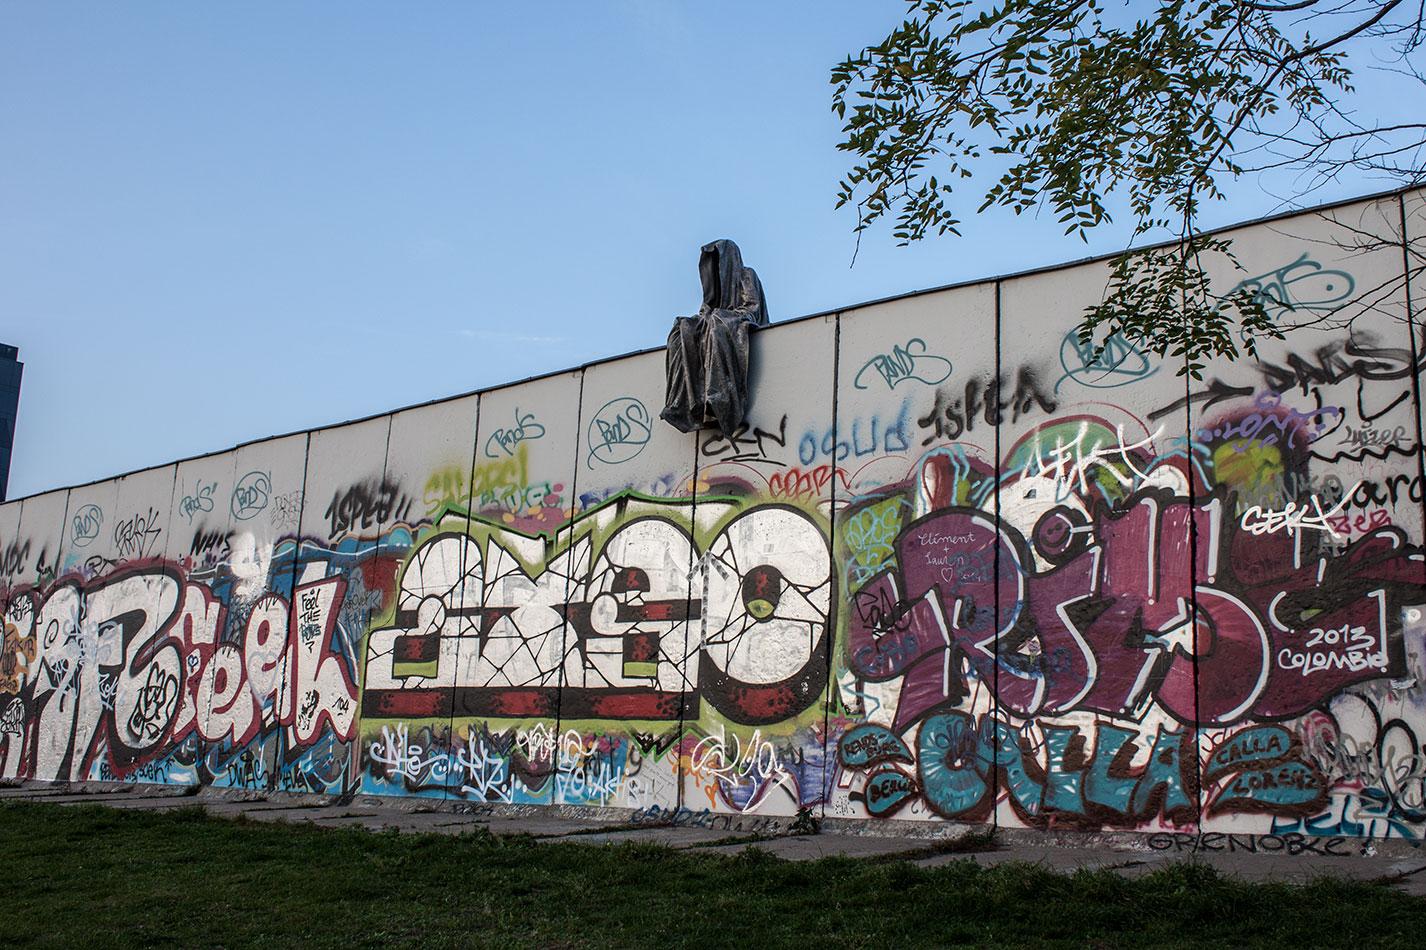 25-jears-wallfall-berlin-germany-contemporary-fine-art-show-arts-design-guardians-of-time-manfred-kili-kielnhofer-4244